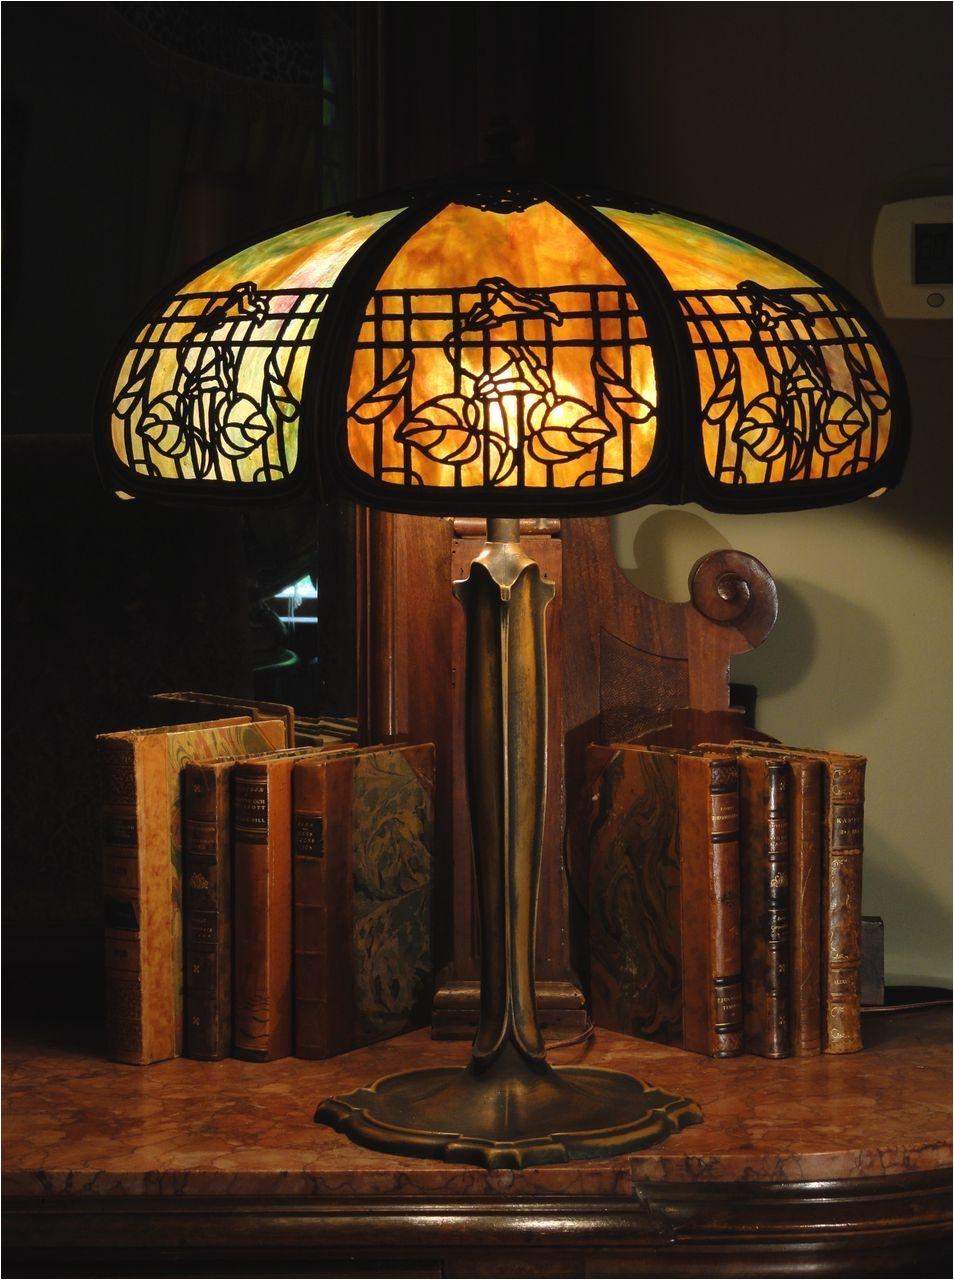 empire lamp co trellis morning glory slag glass lamp stained glass lamp